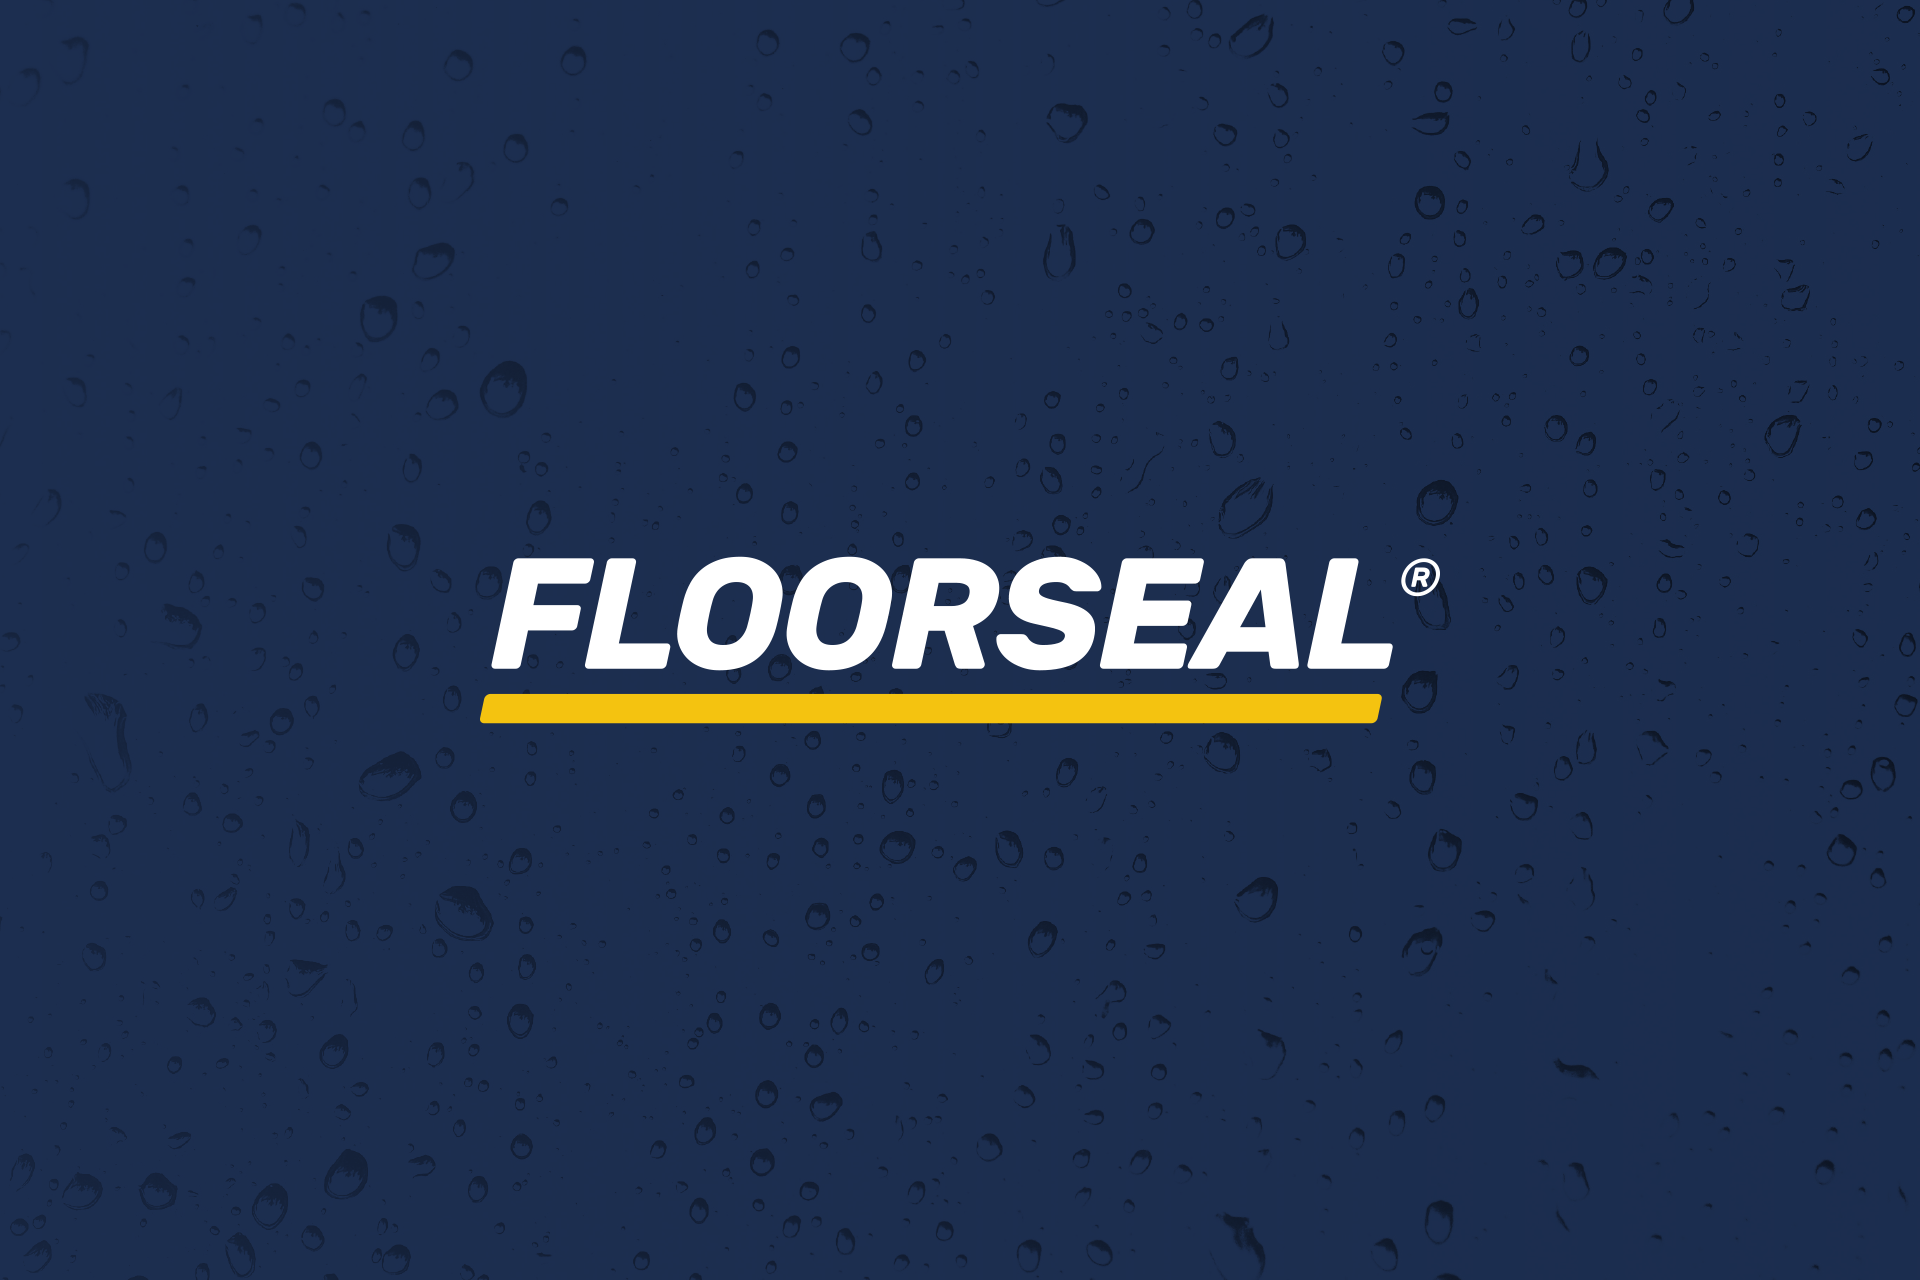 Floorseal